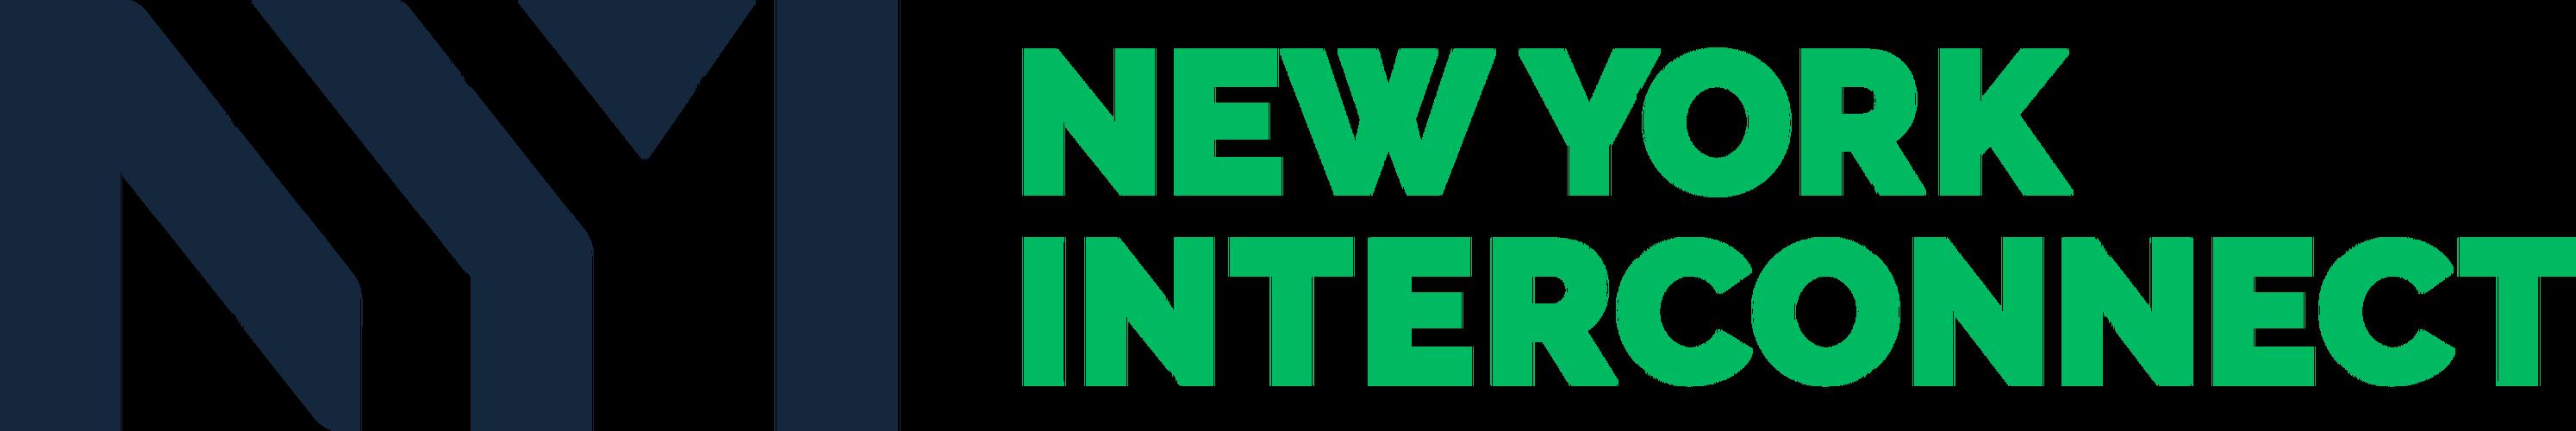 NYInterconnect